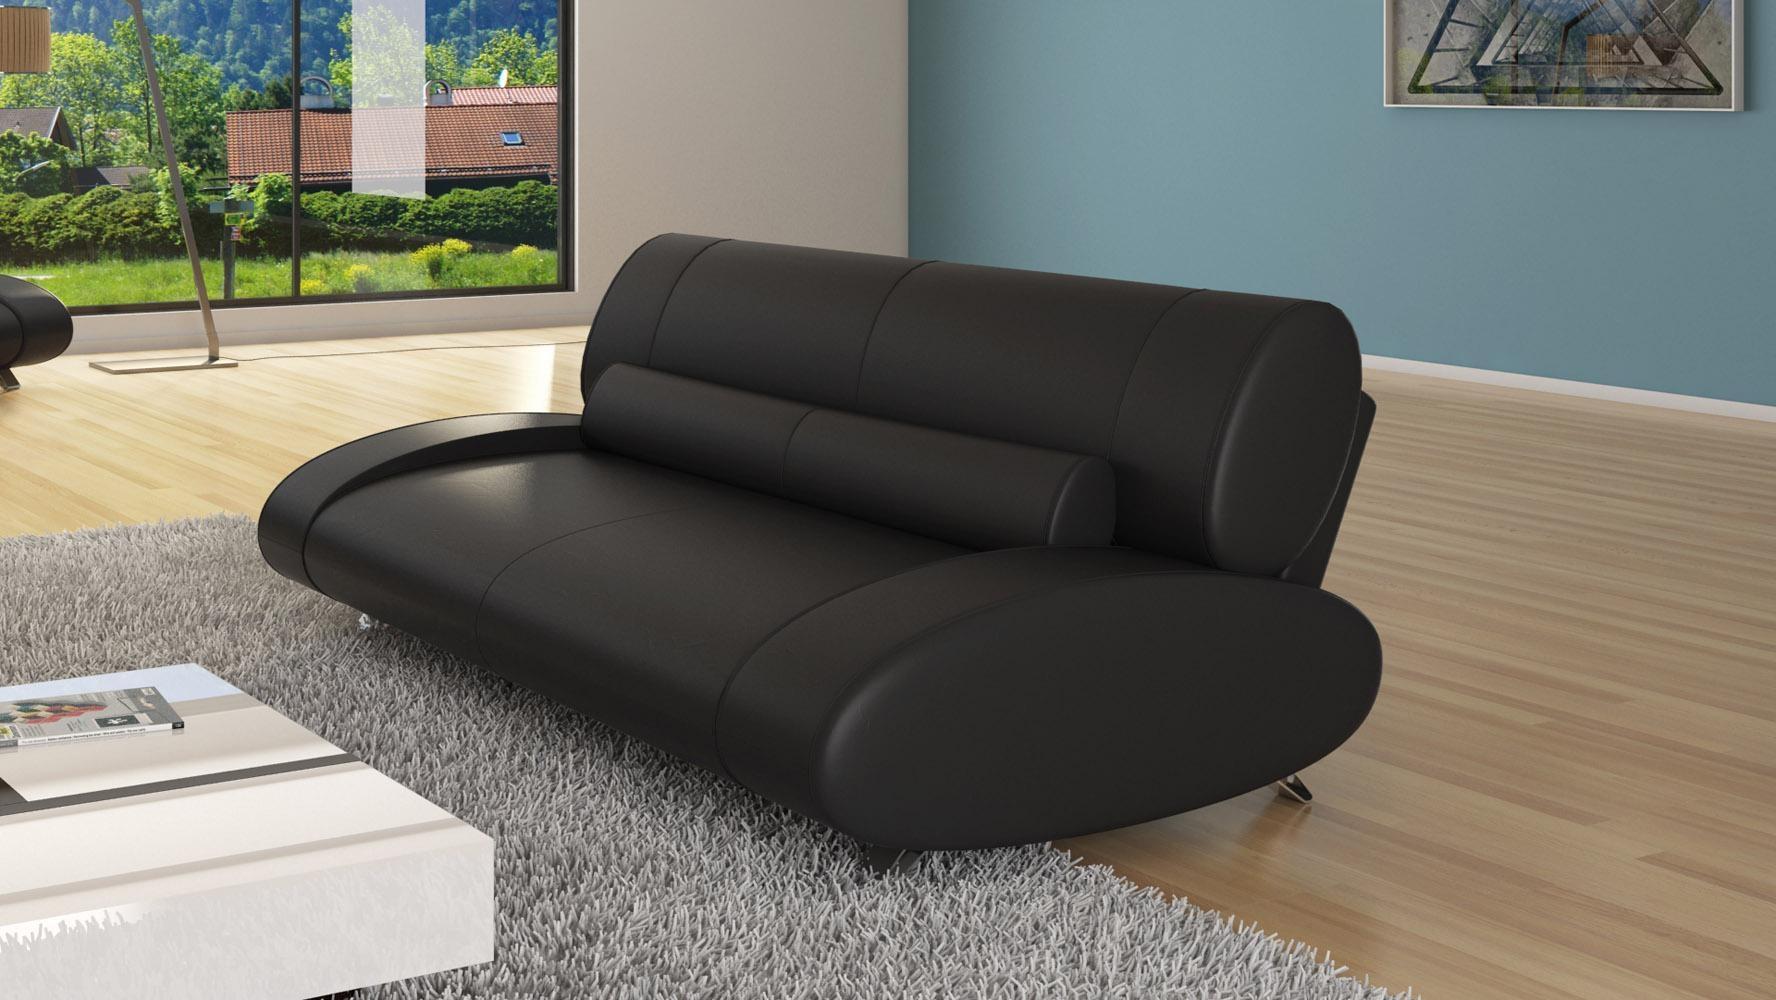 Aspen 3 Seater | Zuri Furniture Inside Aspen Leather Sofas (Image 2 of 20)